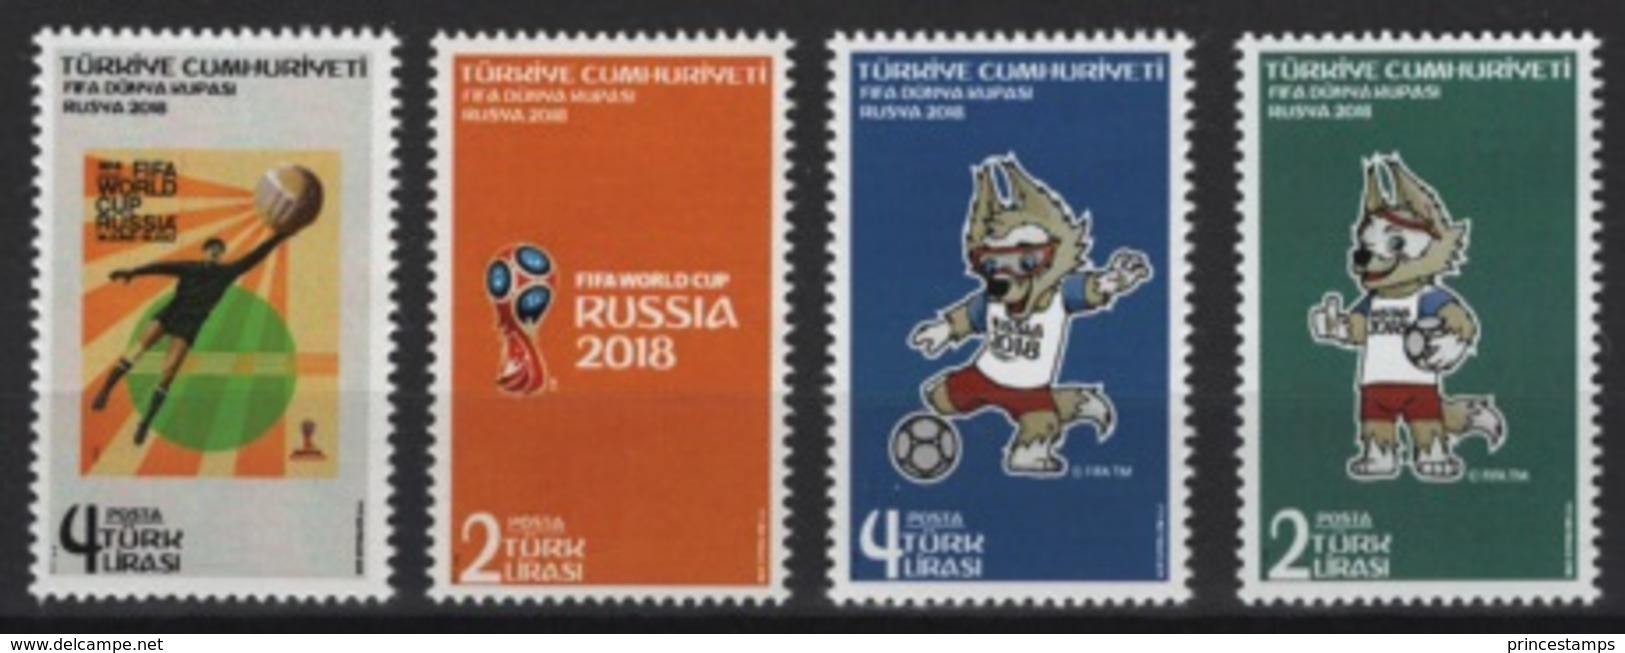 Turkey - Turquie (2018) - Set -  /  World Cup Russia - Soccer - Football - Calcio - Fussball - 2018 – Rusia